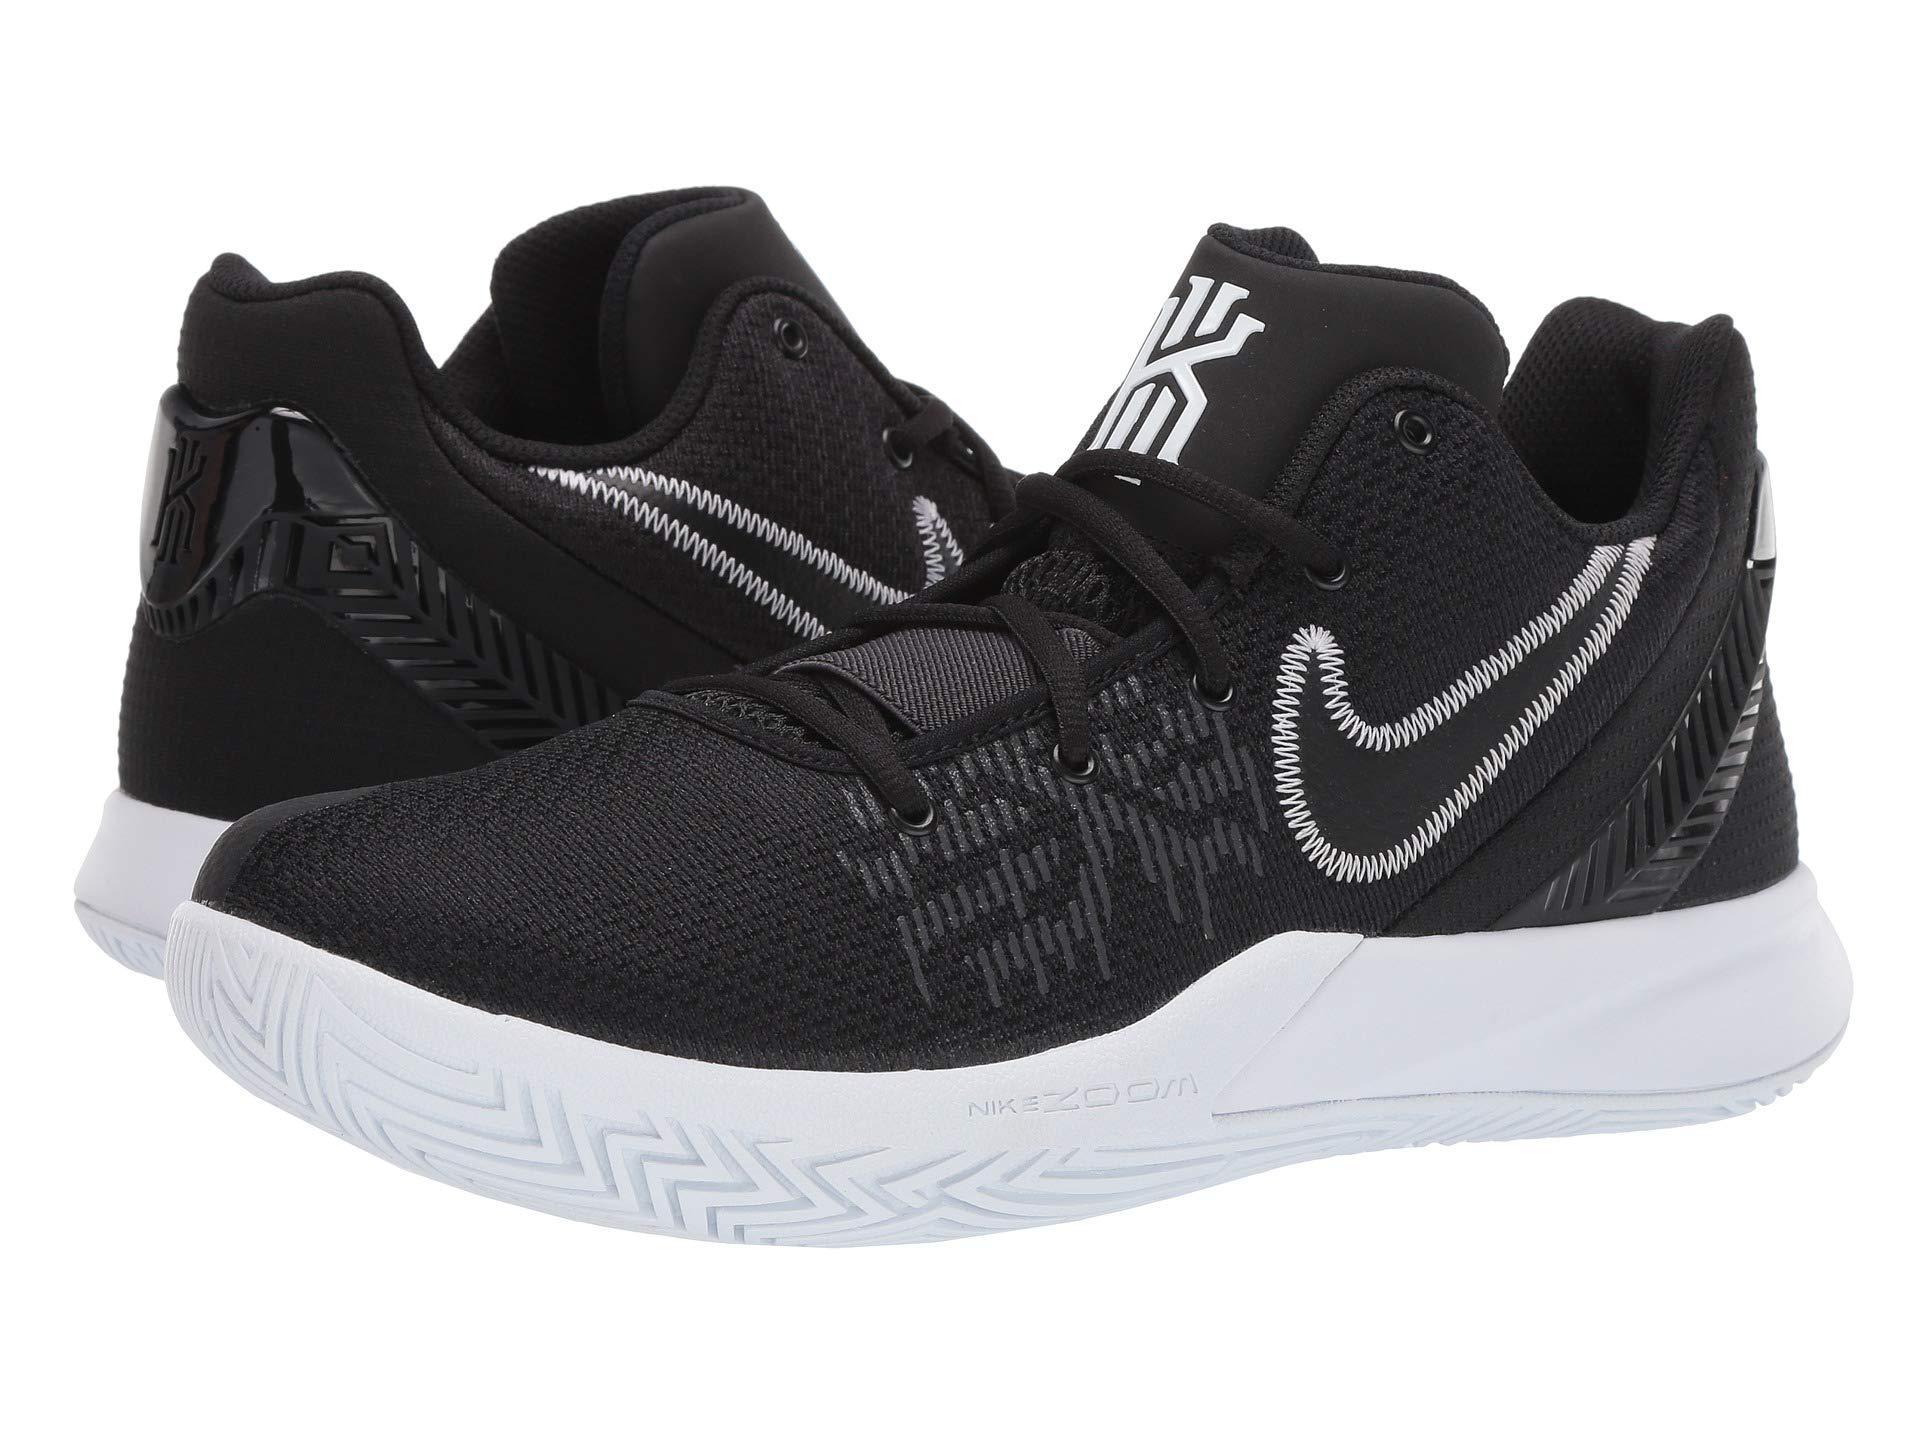 f7f75f2cfc0 Lyst - Nike Kyrie Flytrap Ii (black black white) Men s Basketball ...